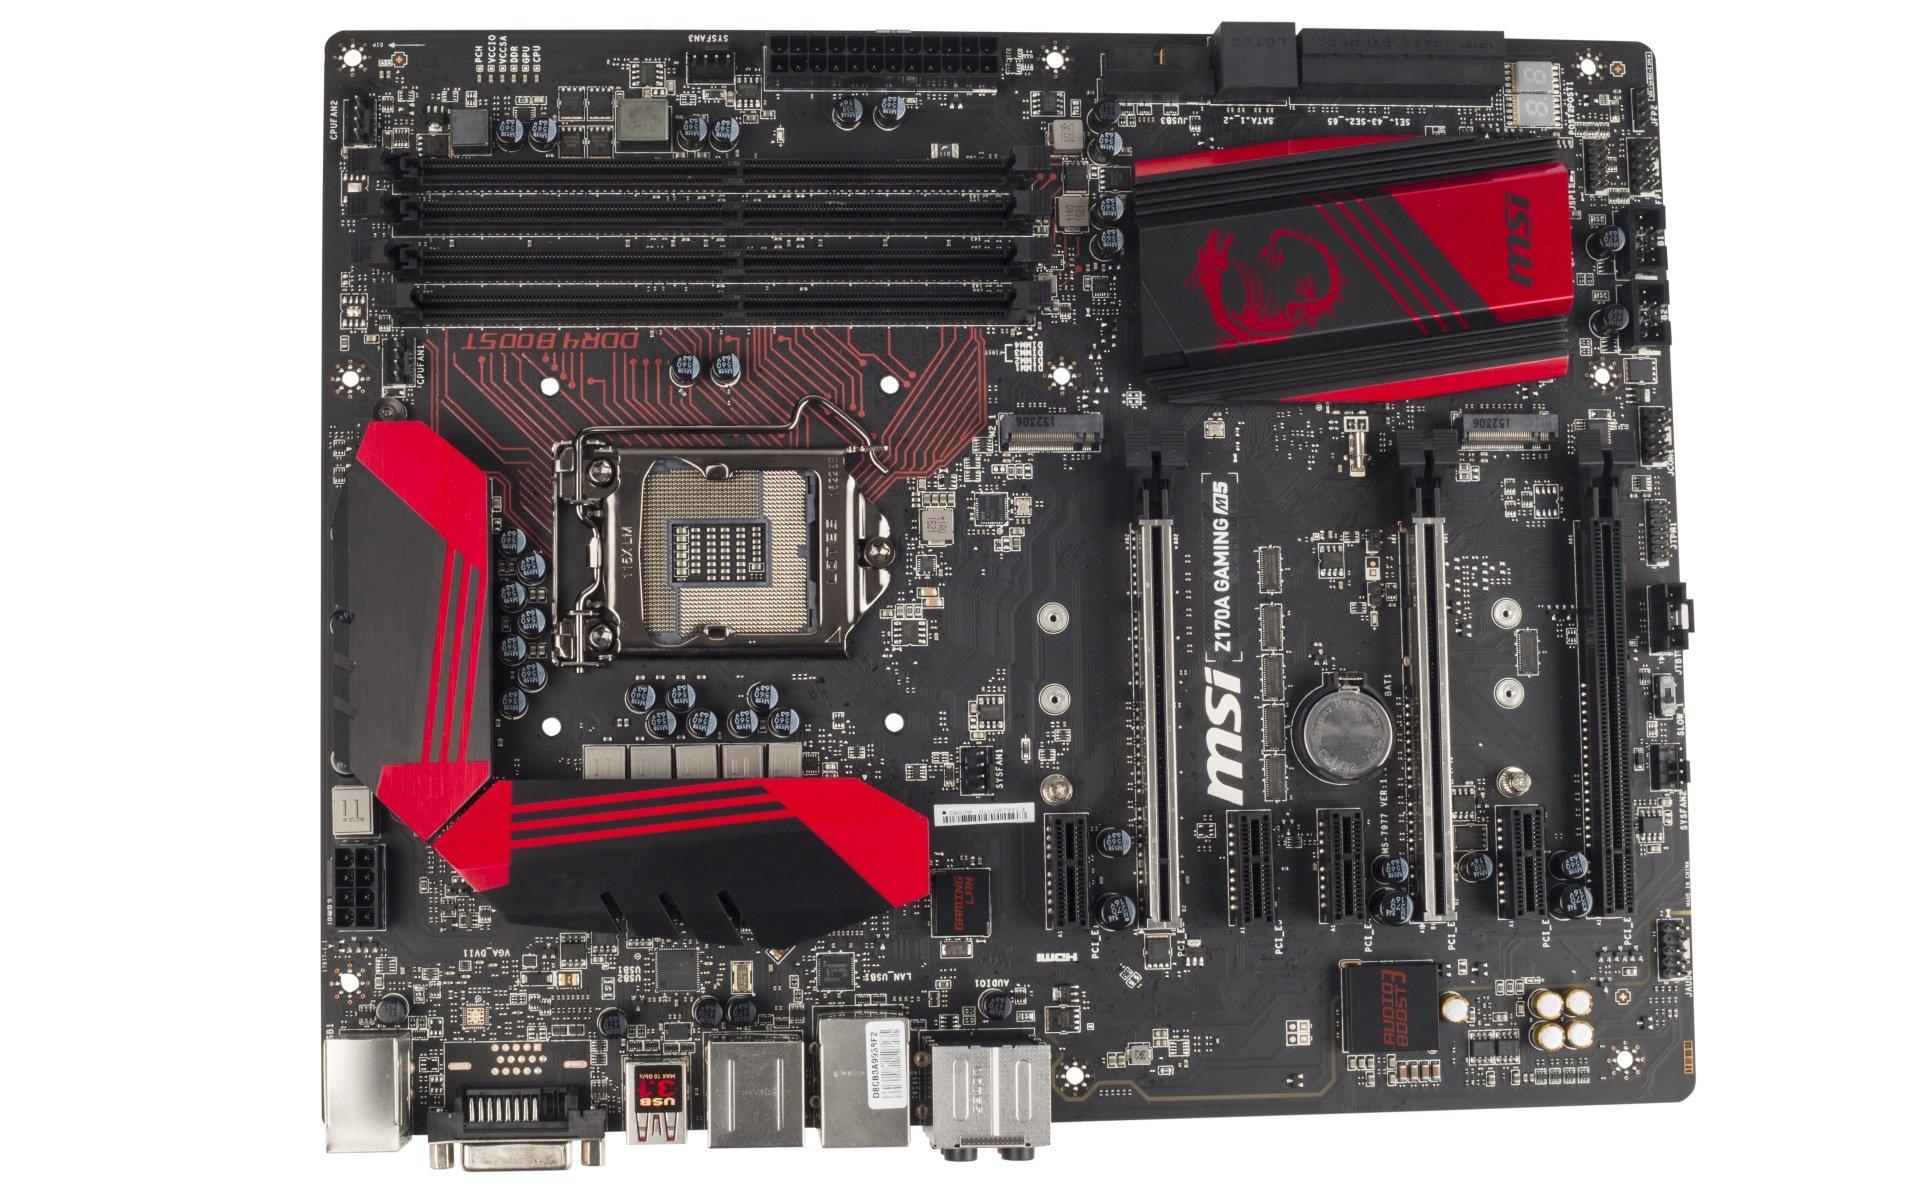 MSI Z170A GAMING M5 LGA 1151 Intel Z170 HDMI SATA